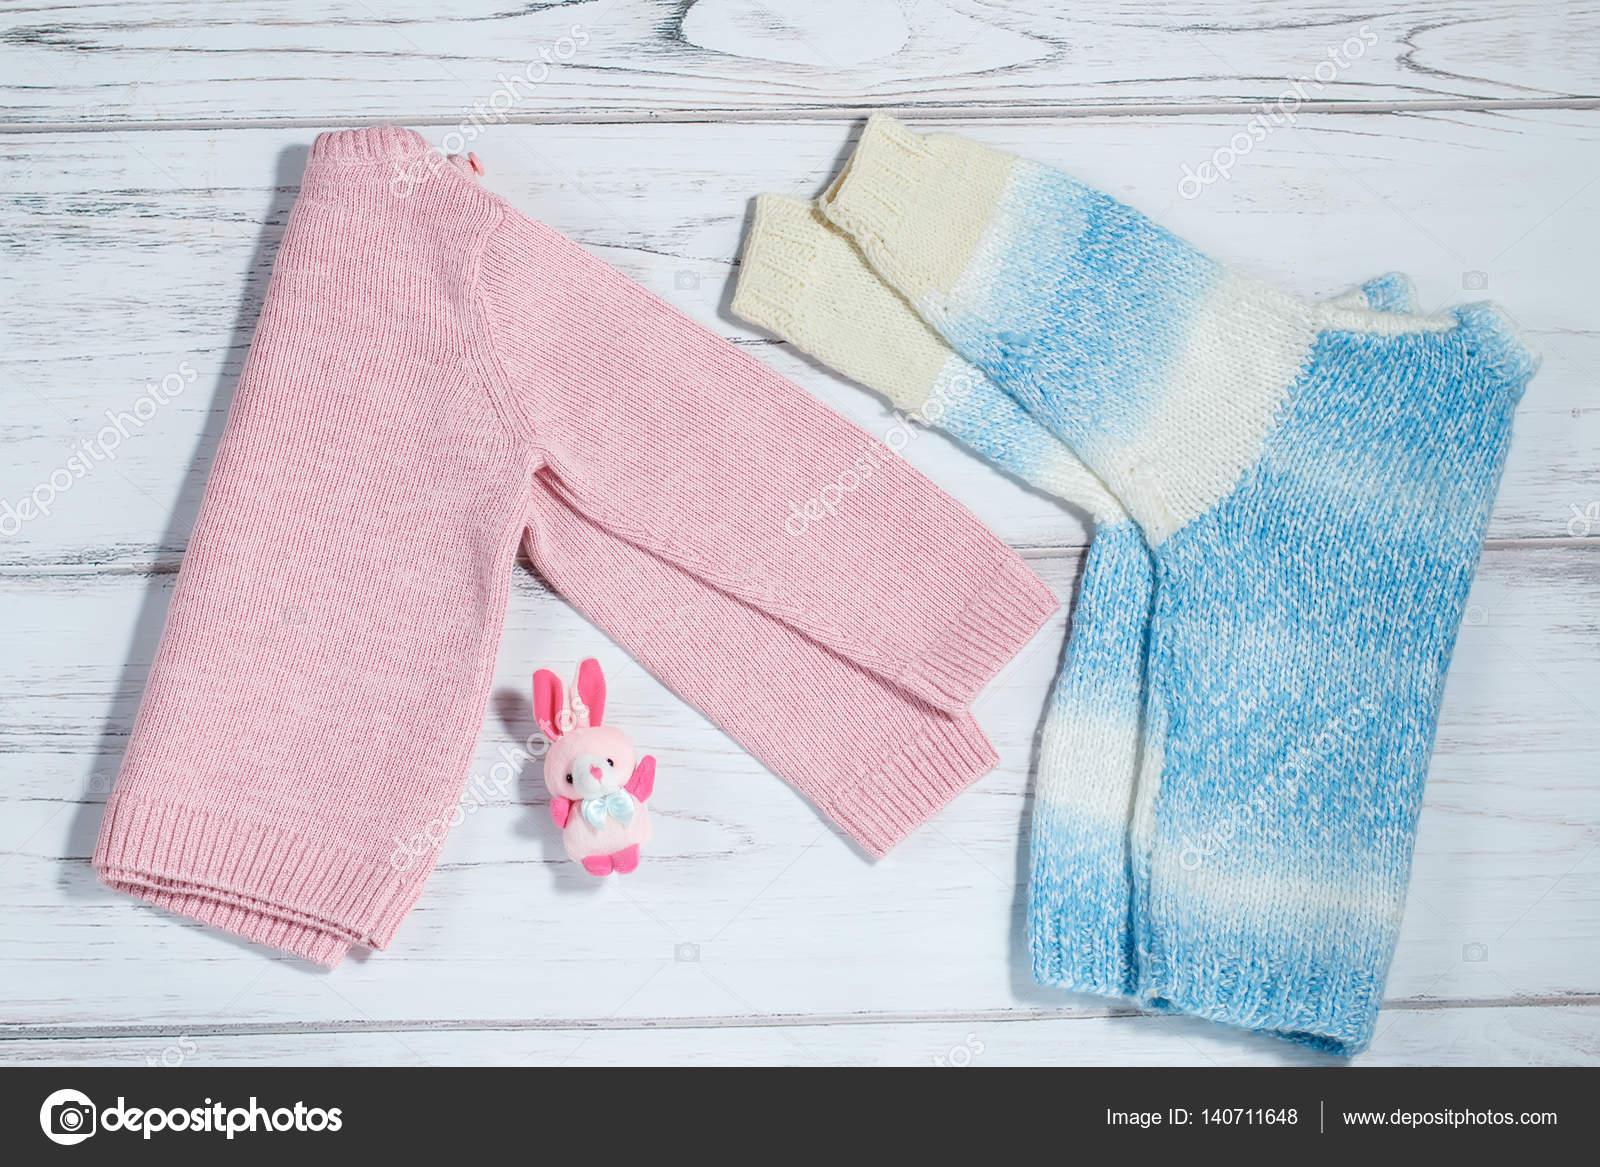 04b85534d795 Ζευγάρι πουλόβερ για μωρά — Φωτογραφία Αρχείου © marythepooh  140711648